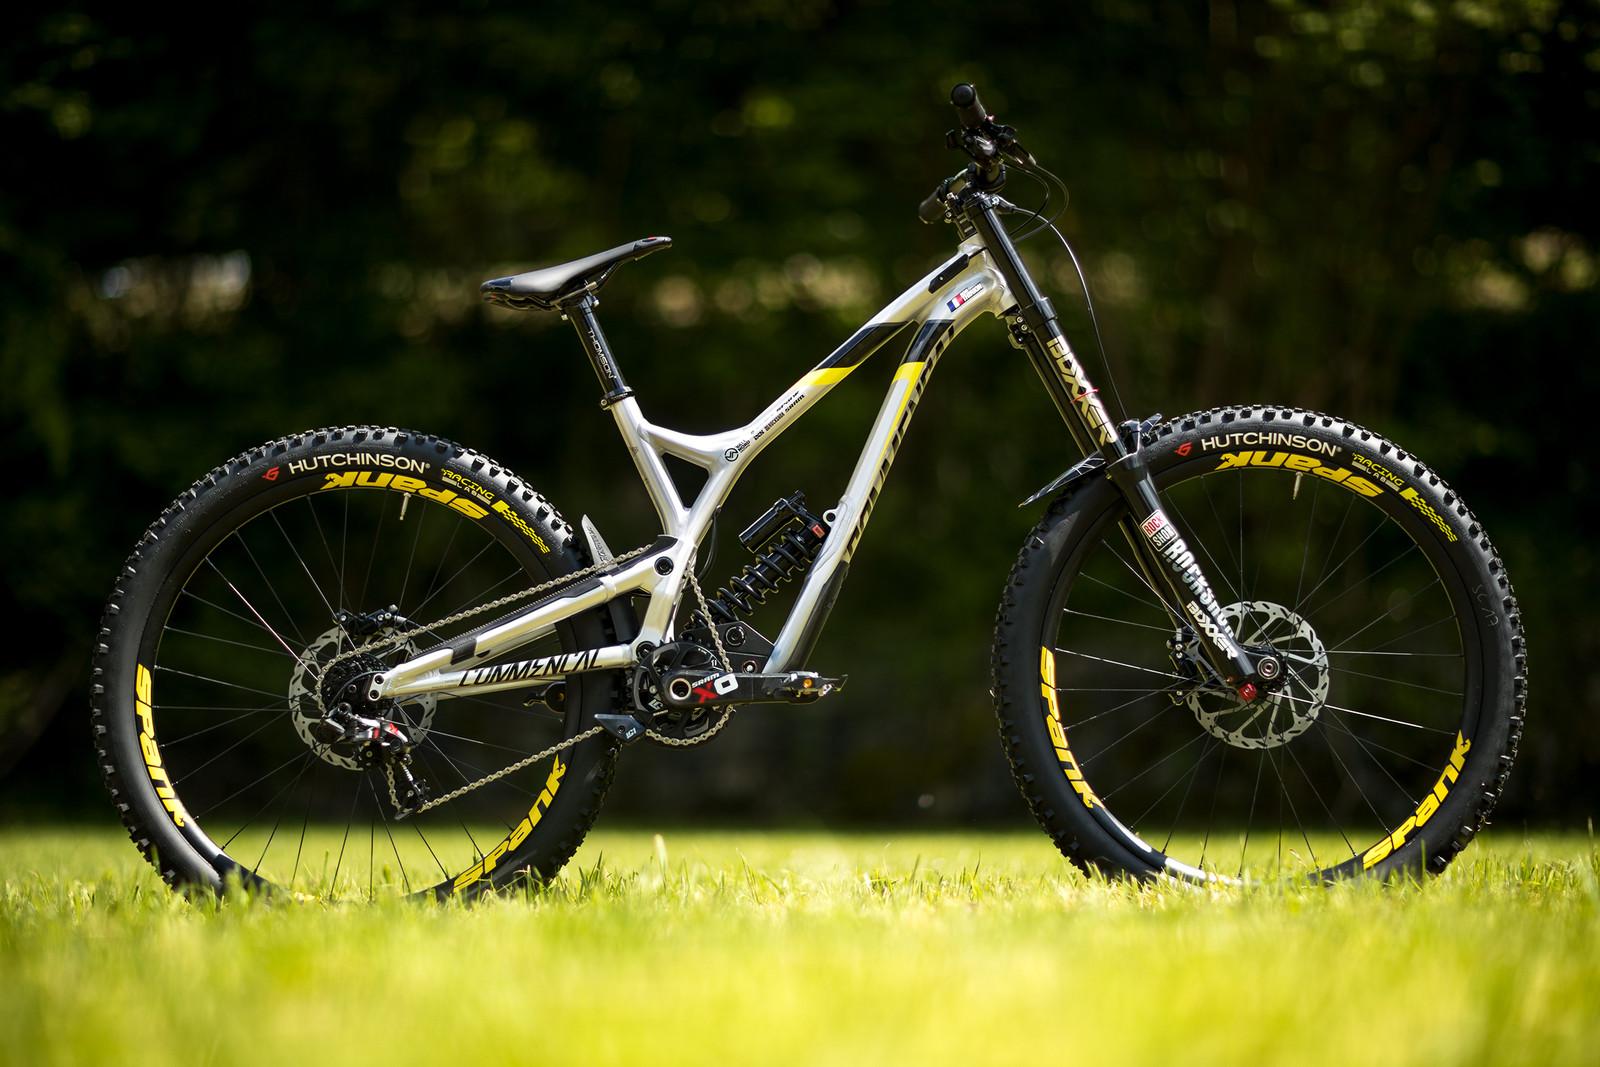 Remi's bike